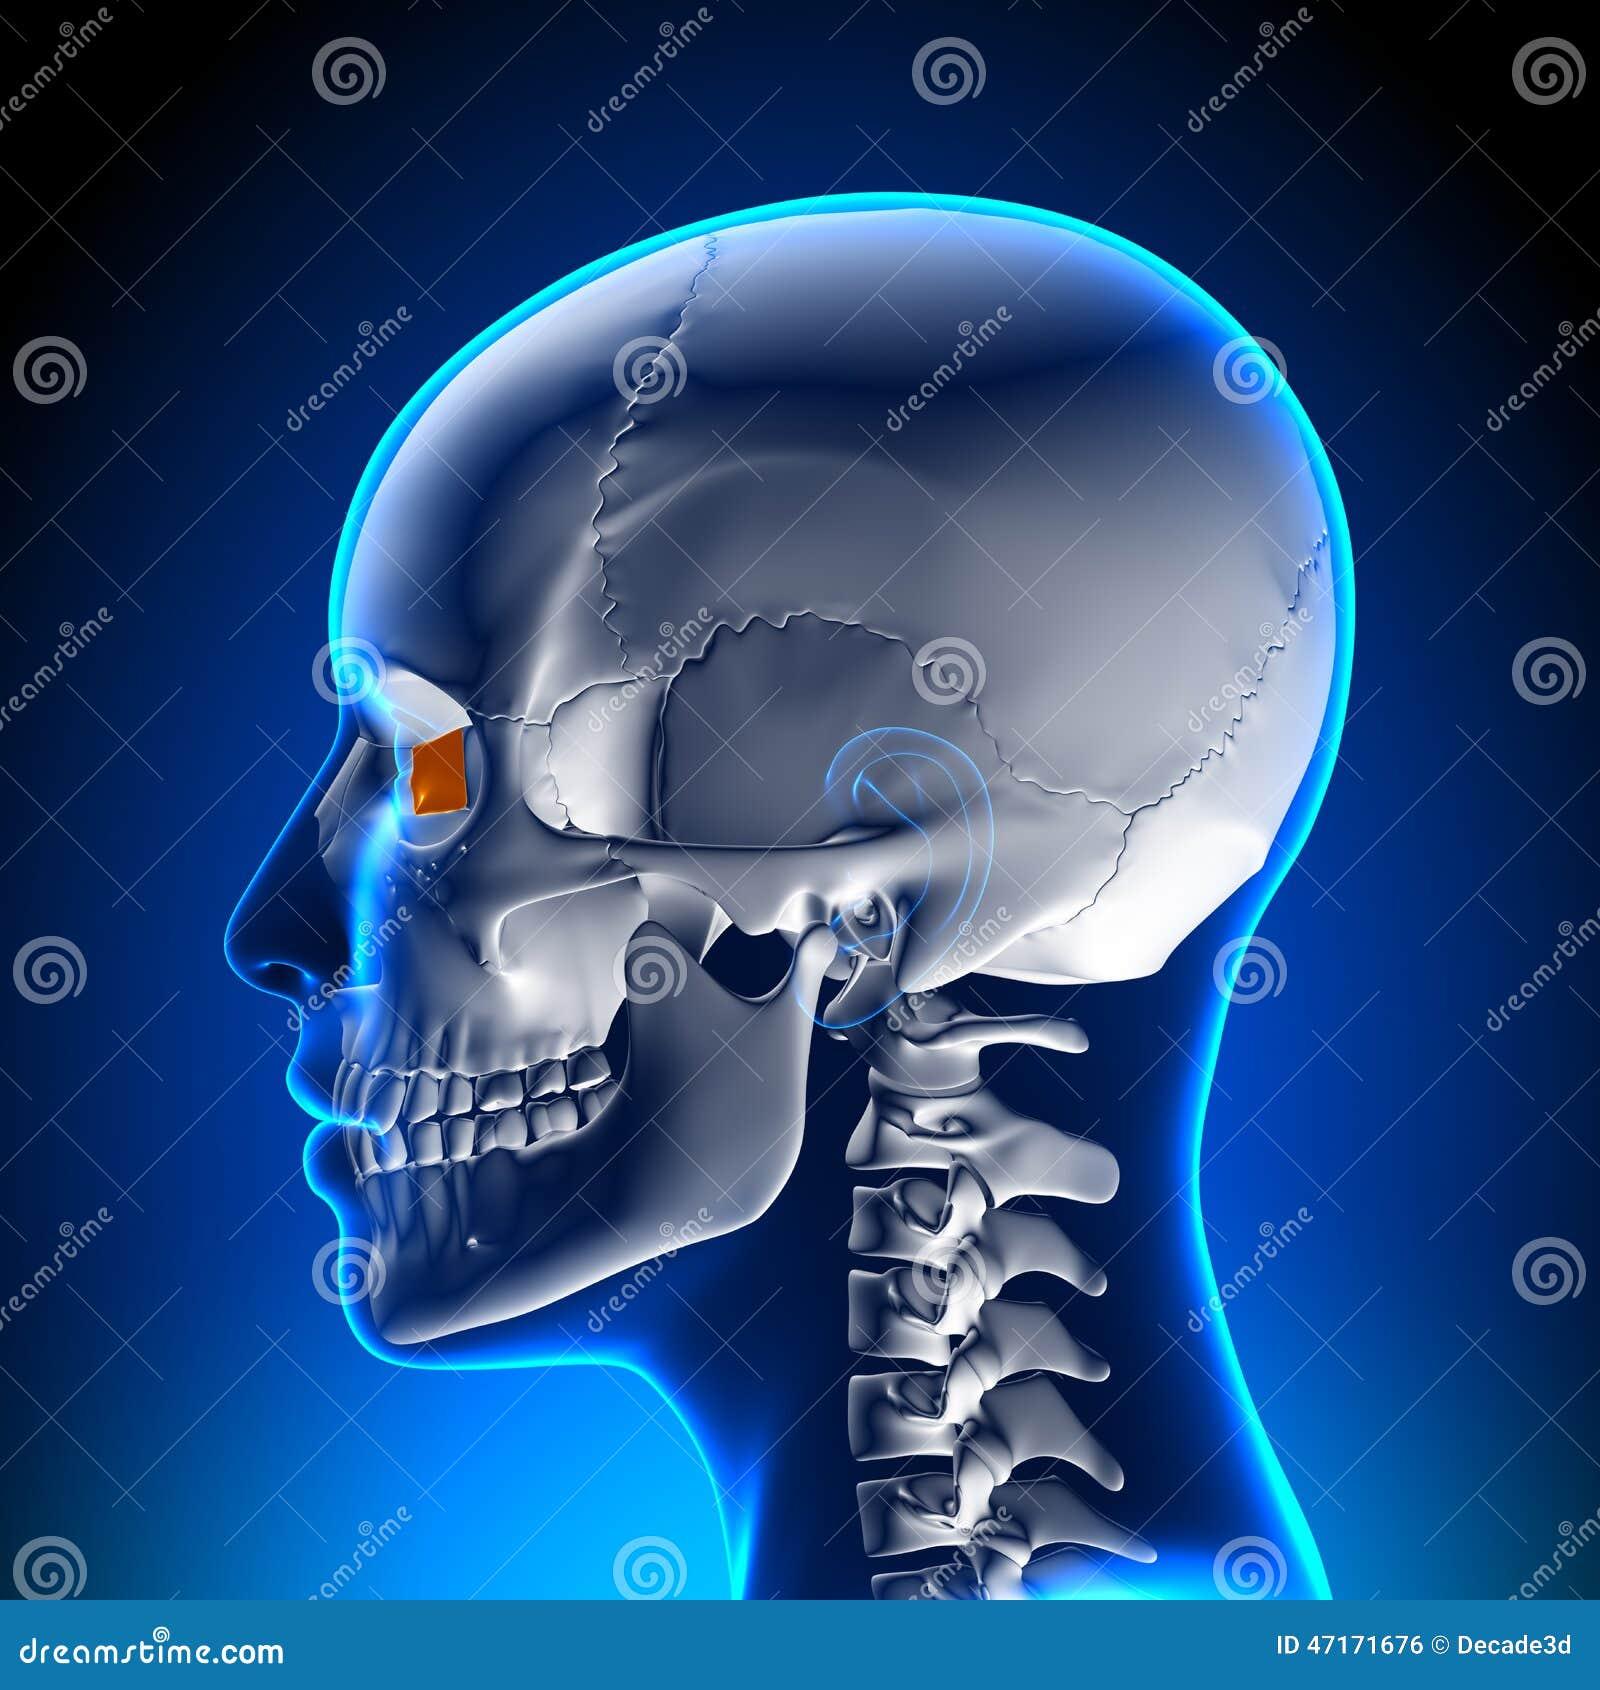 Female Lacrimal Bone - Skull / Cranium Anatomy Stock Illustration ...